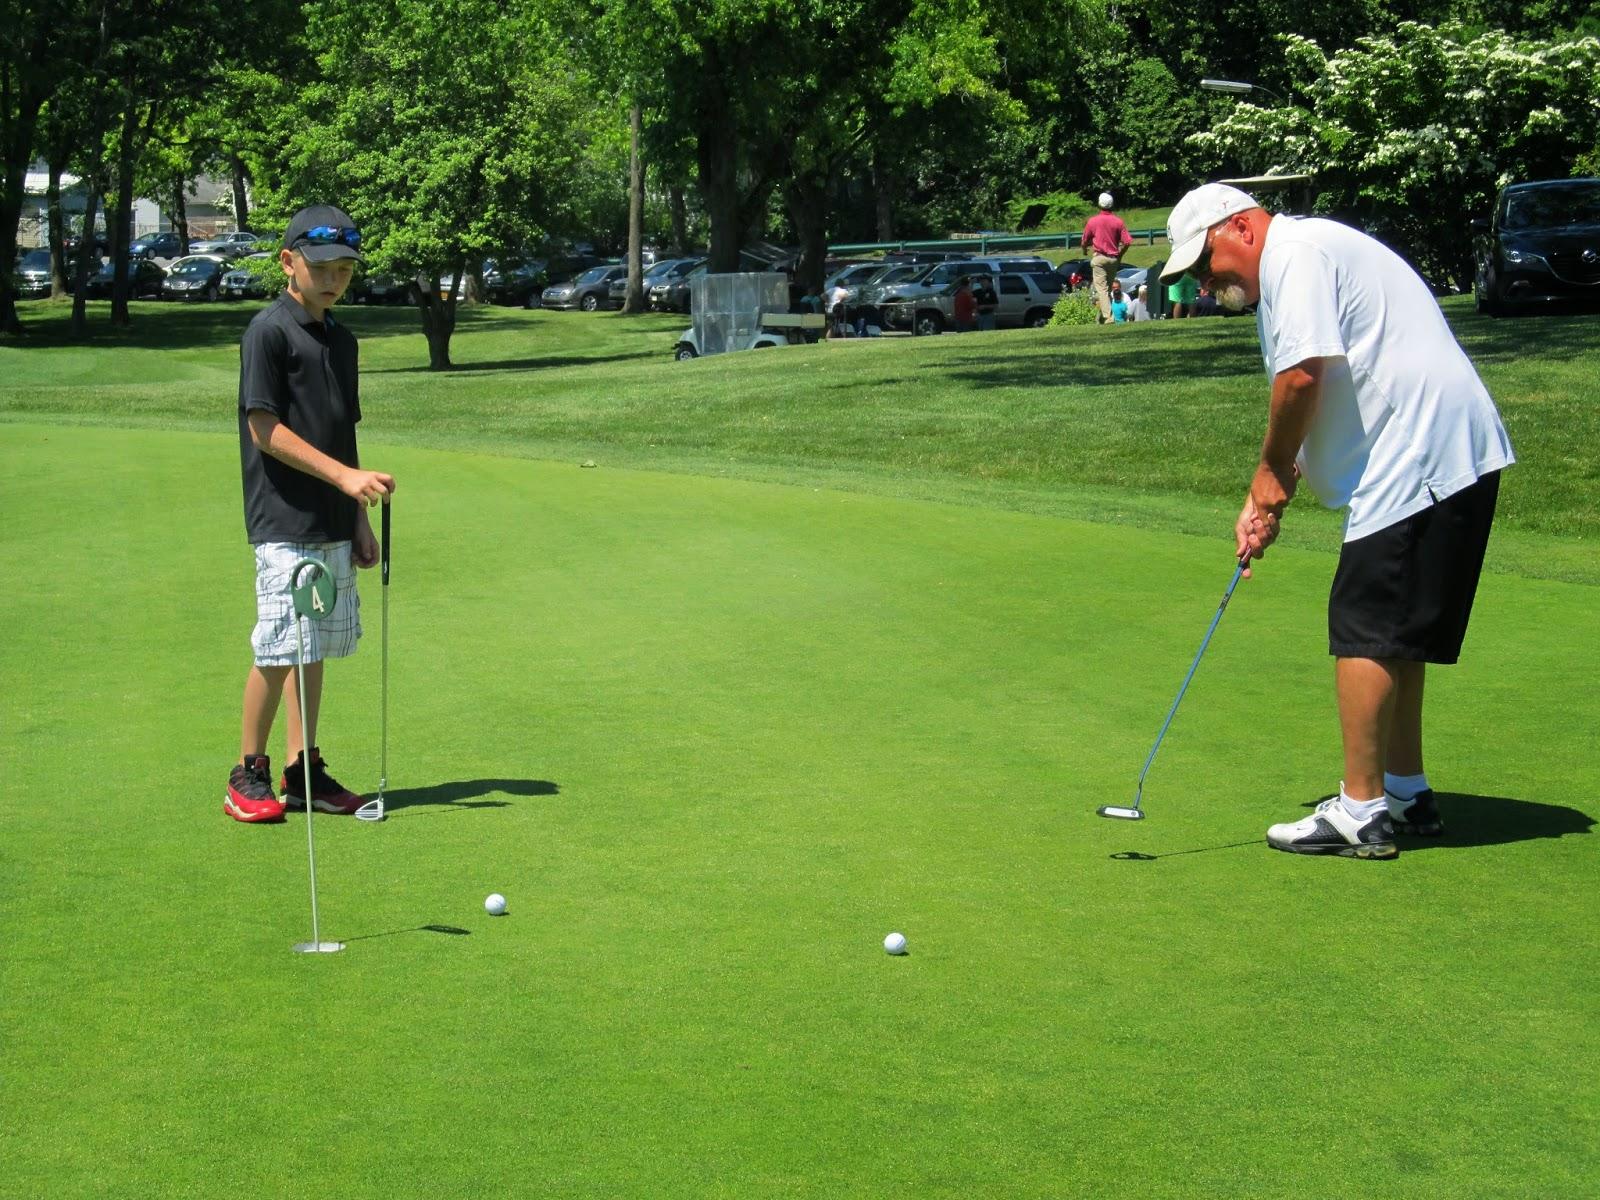 Lehigh Valley Ramblings Boys And Girls Club Golf Tourney Draws 114 Golfers